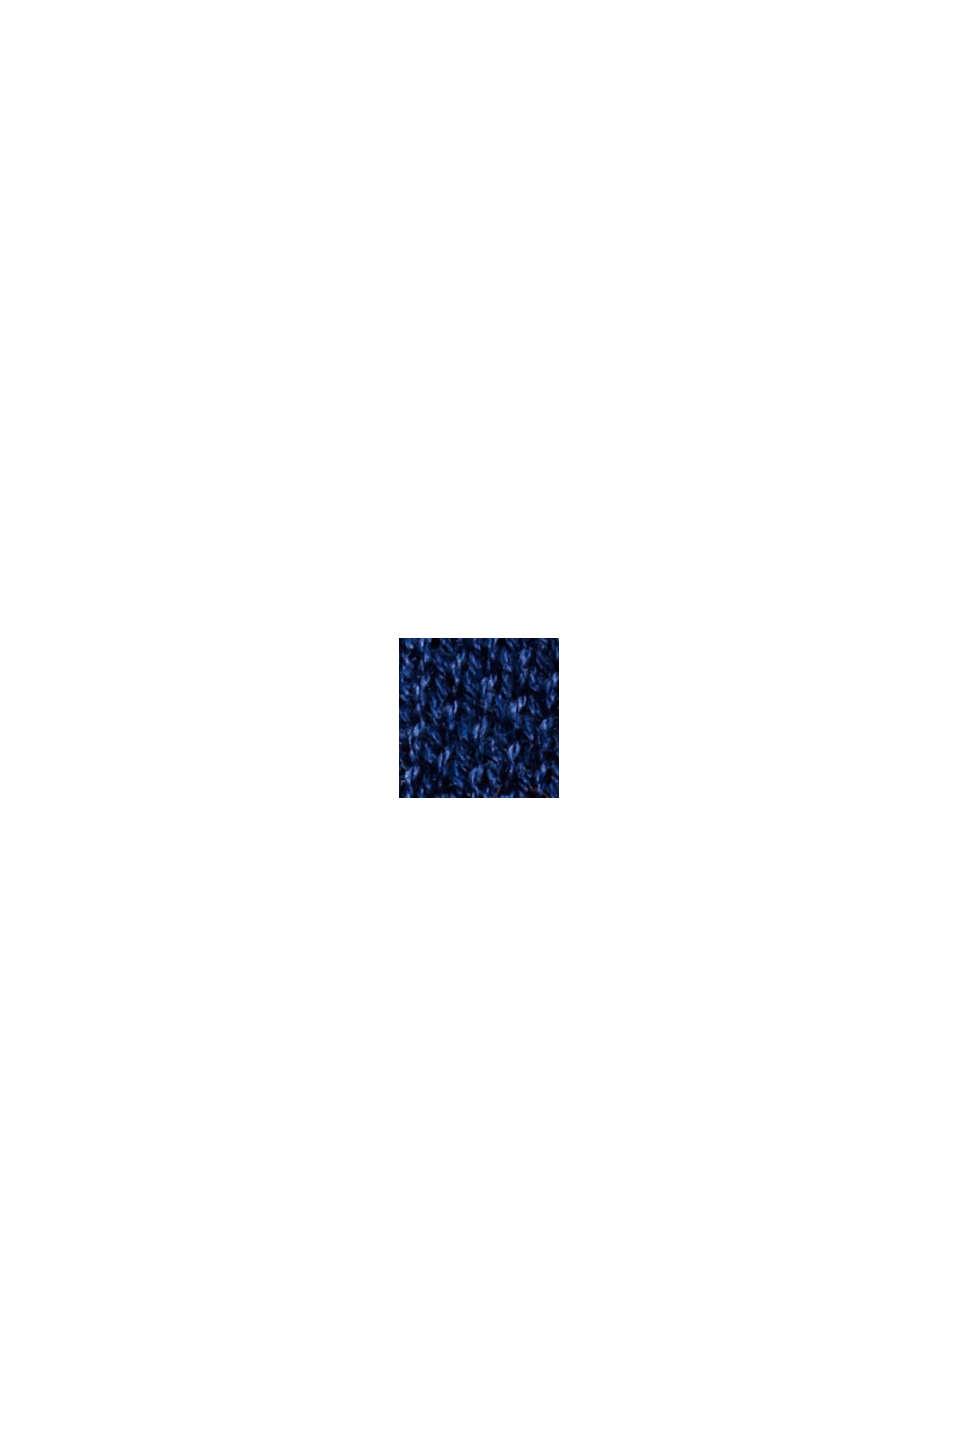 Pull-over color block 100% coton bio, NAVY, swatch